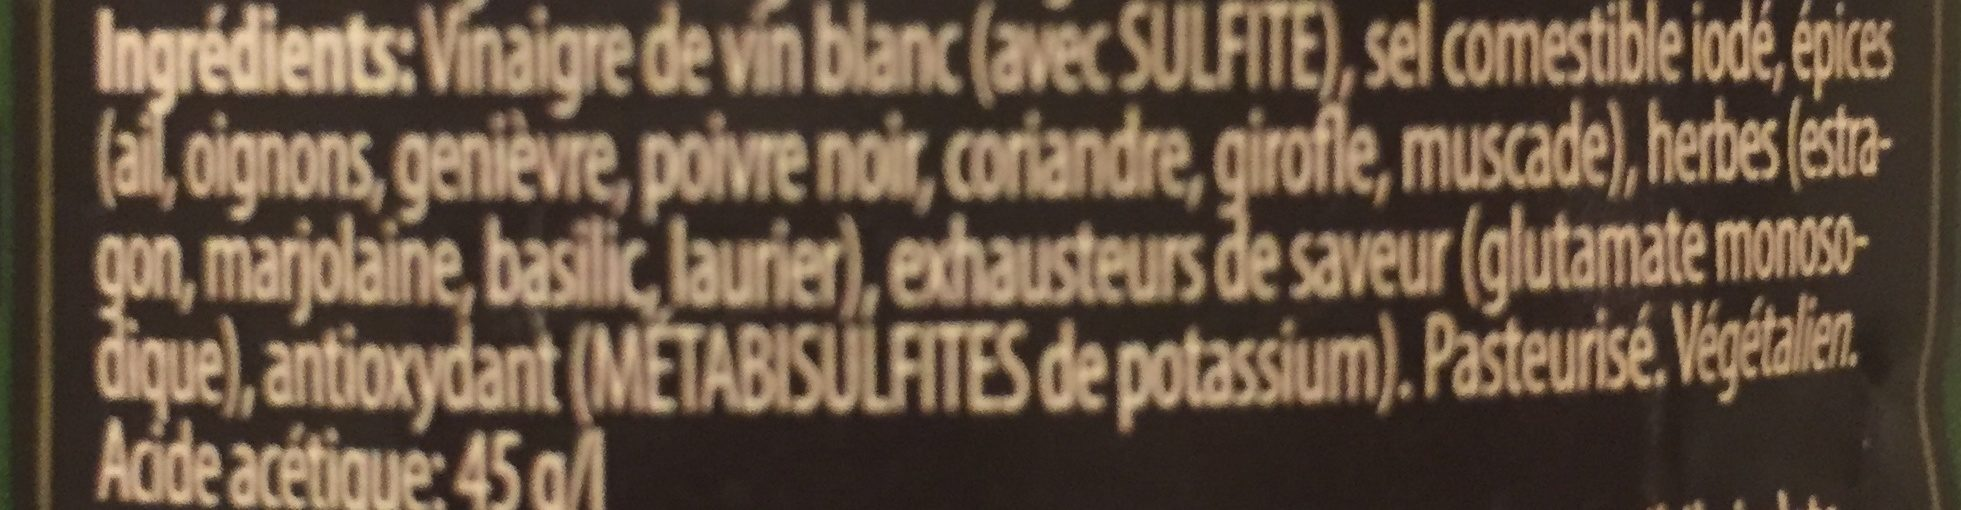 Vinaigre de vin aux herbes - Ingredients